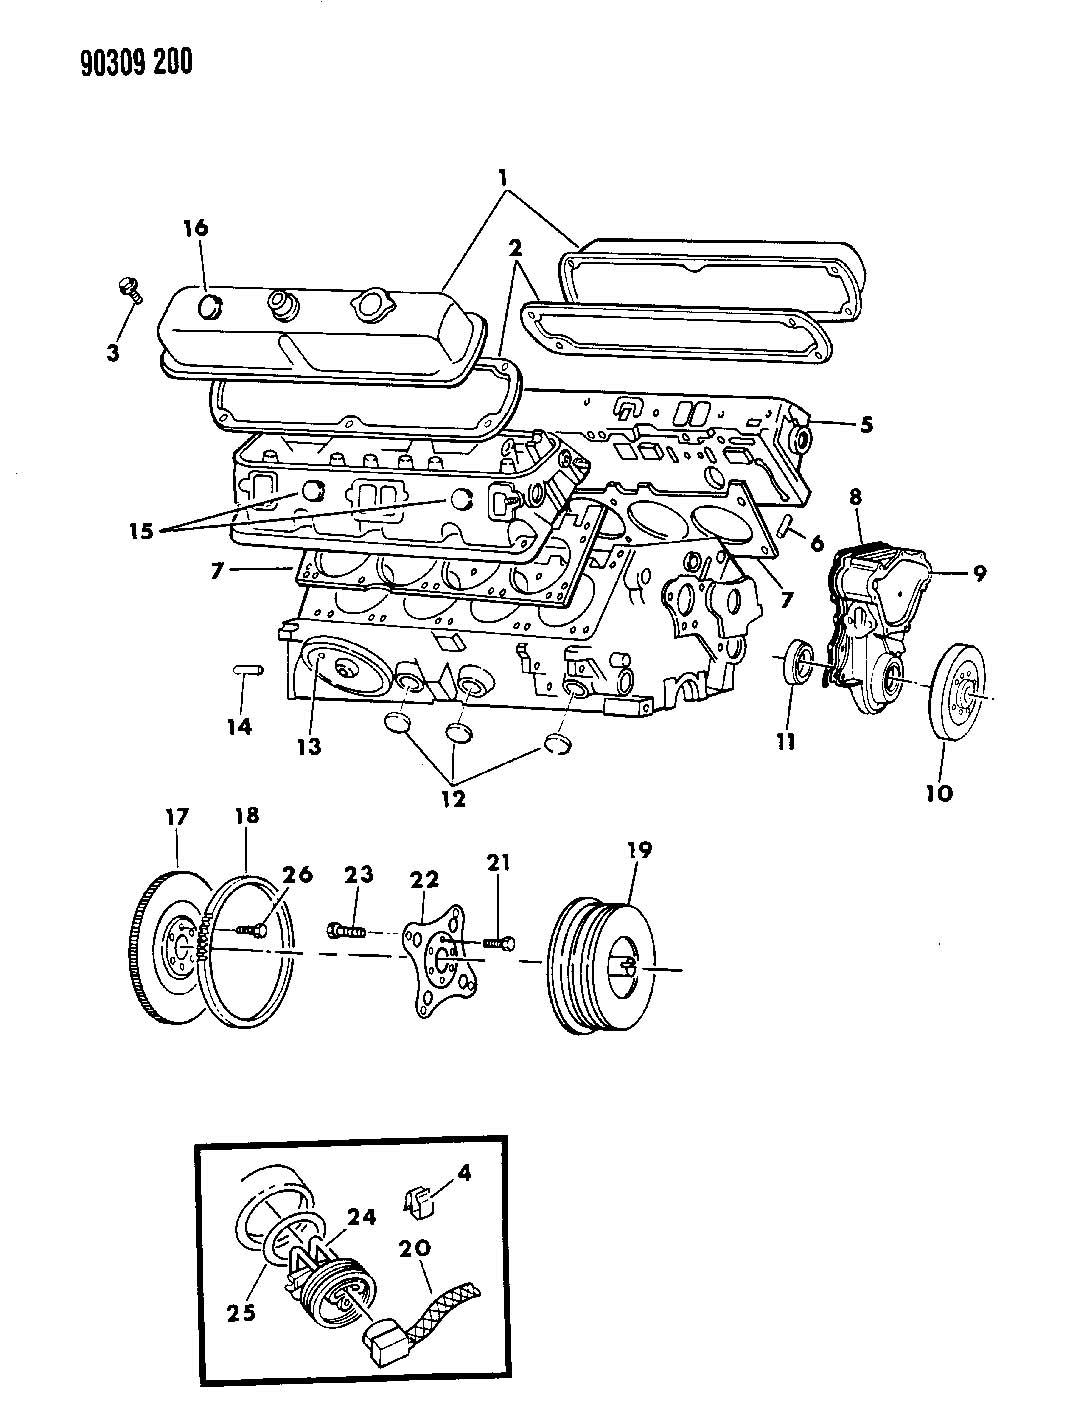 1991 Dodge Dakota Plate, torque converter drive, plate